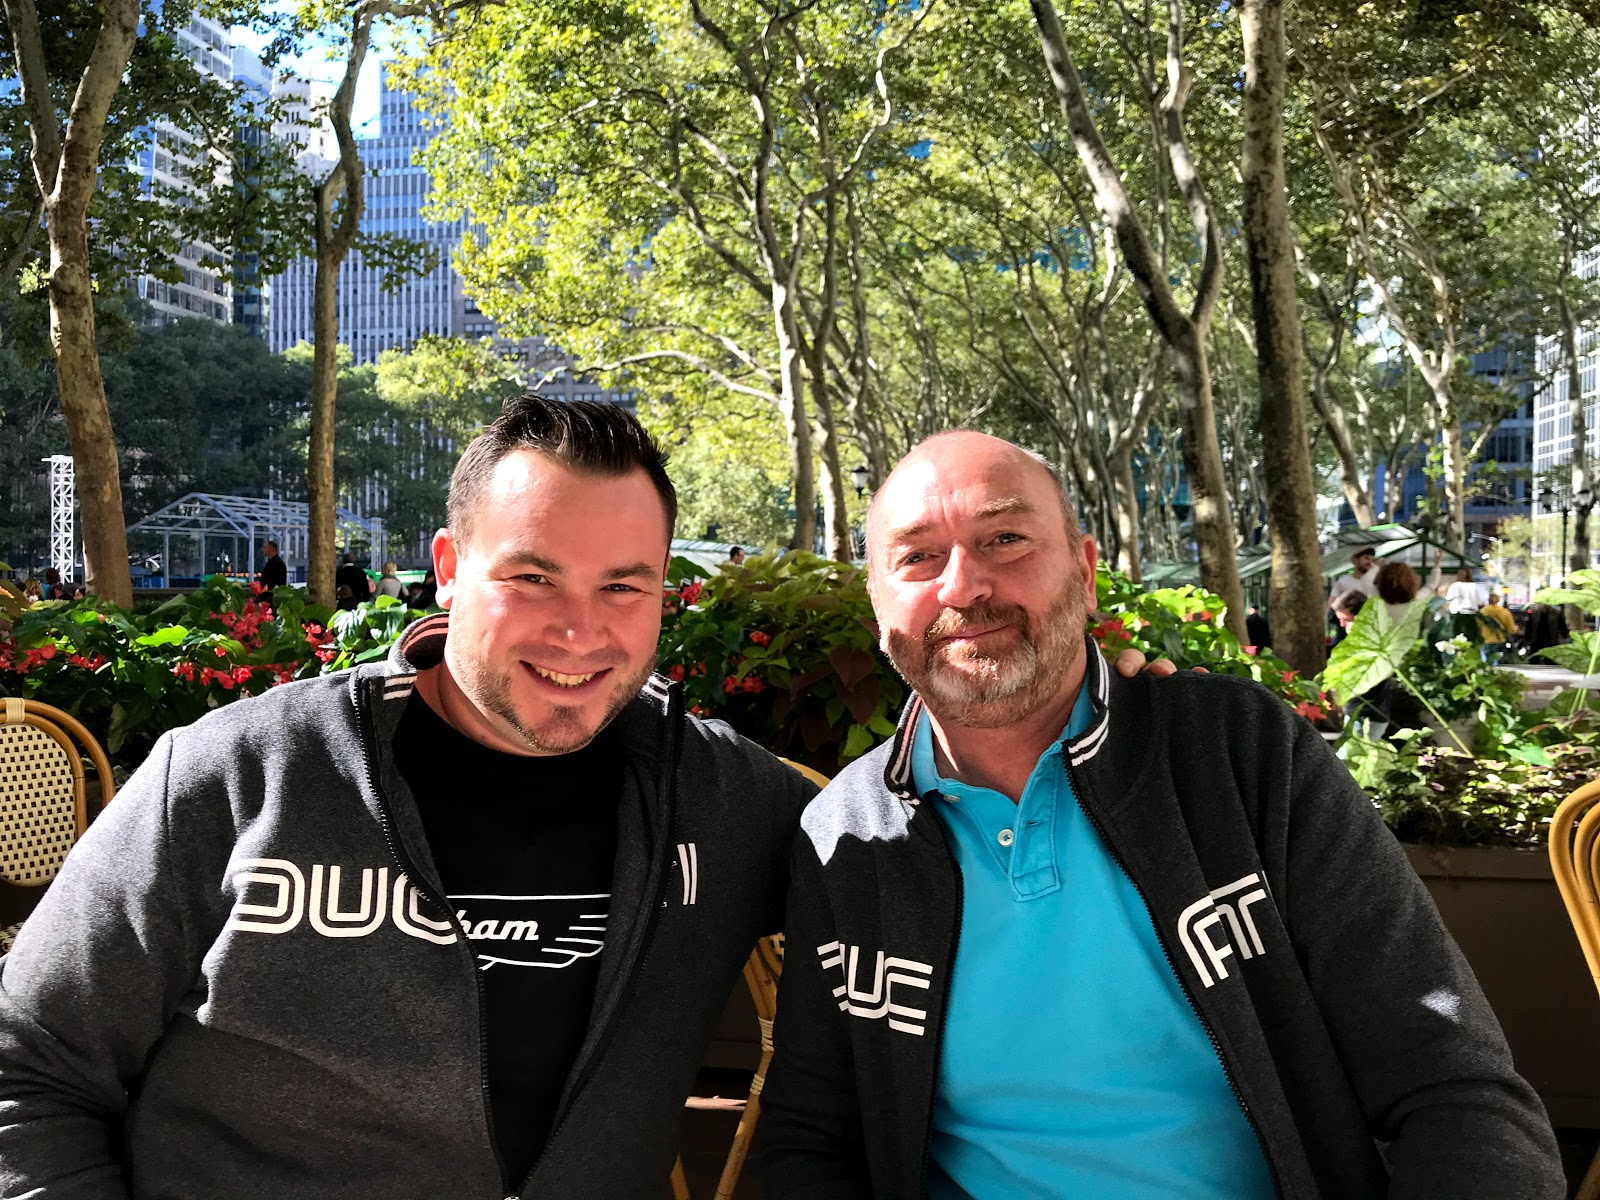 Tigh Loughhead and Brian Kirwain GothamDOC and DucatiPerformanceClub from Paris in NYC